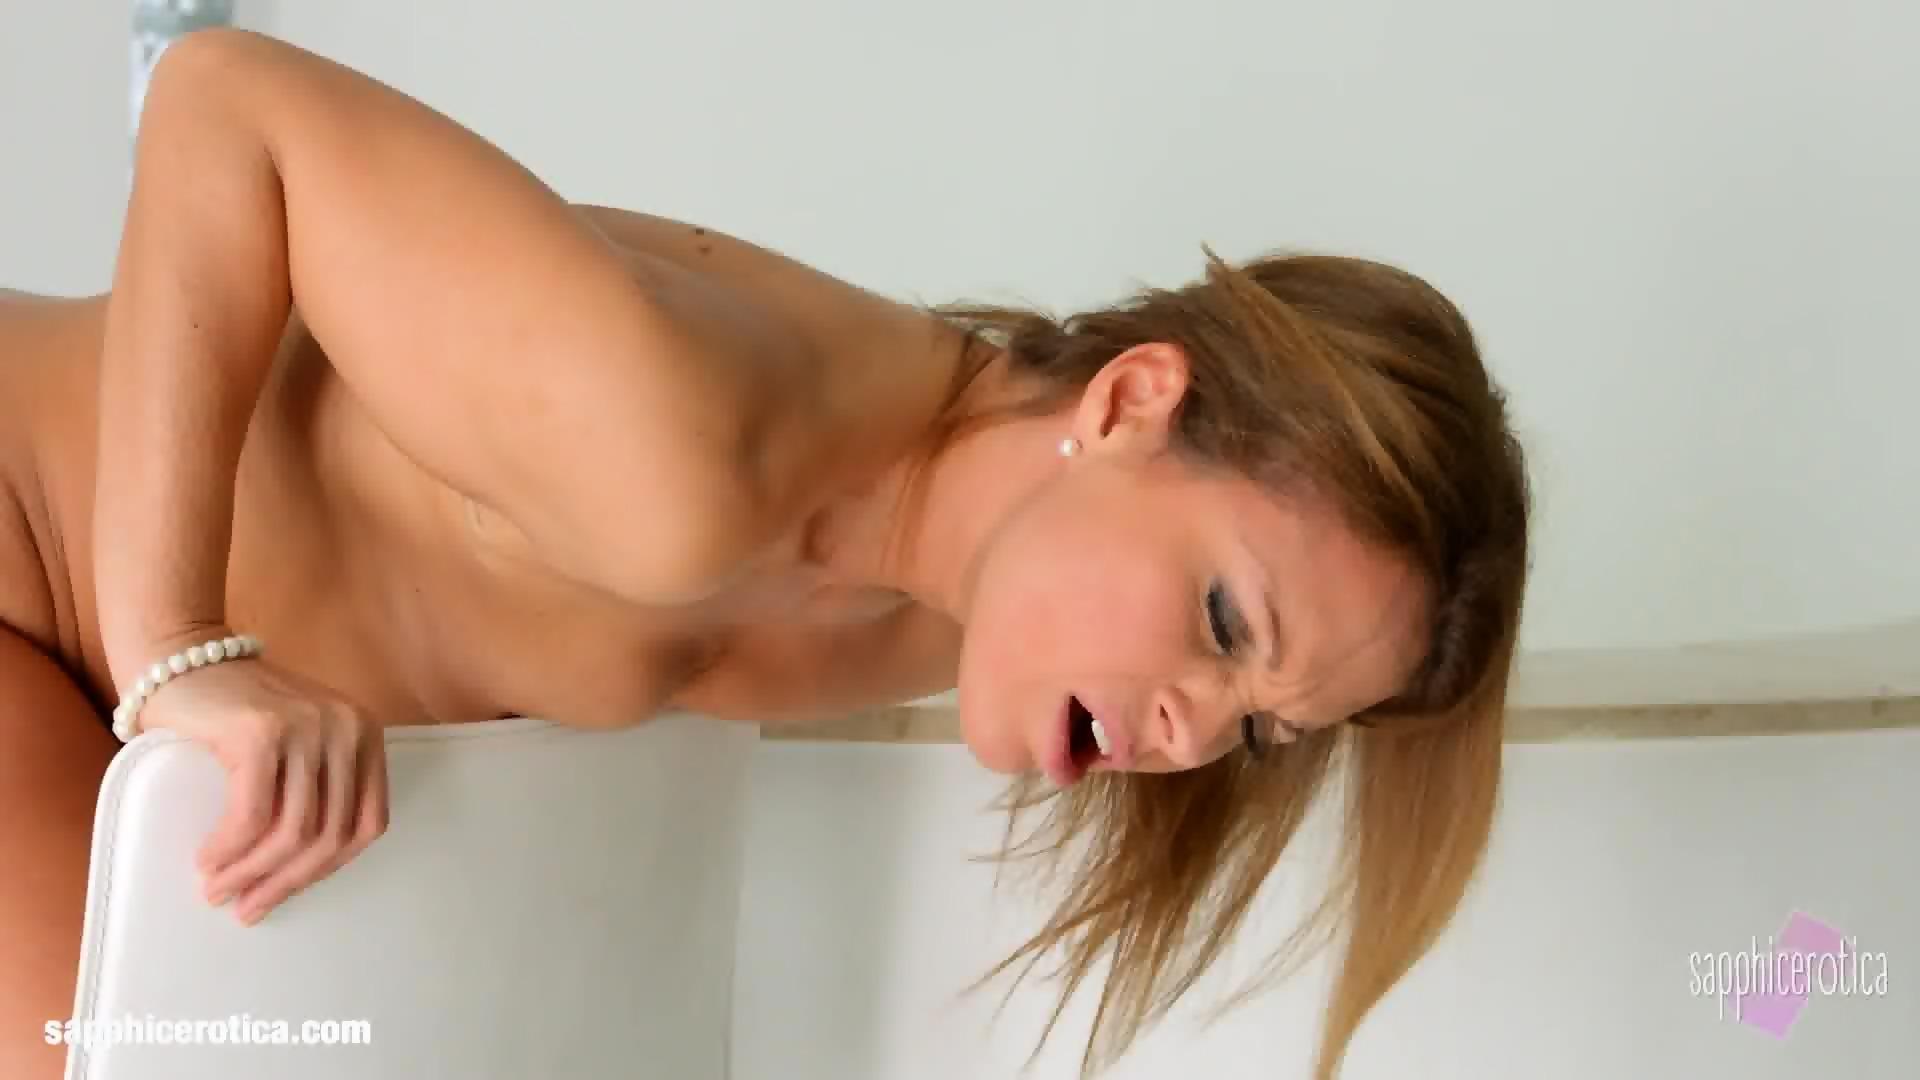 Busty sluts with phones nude